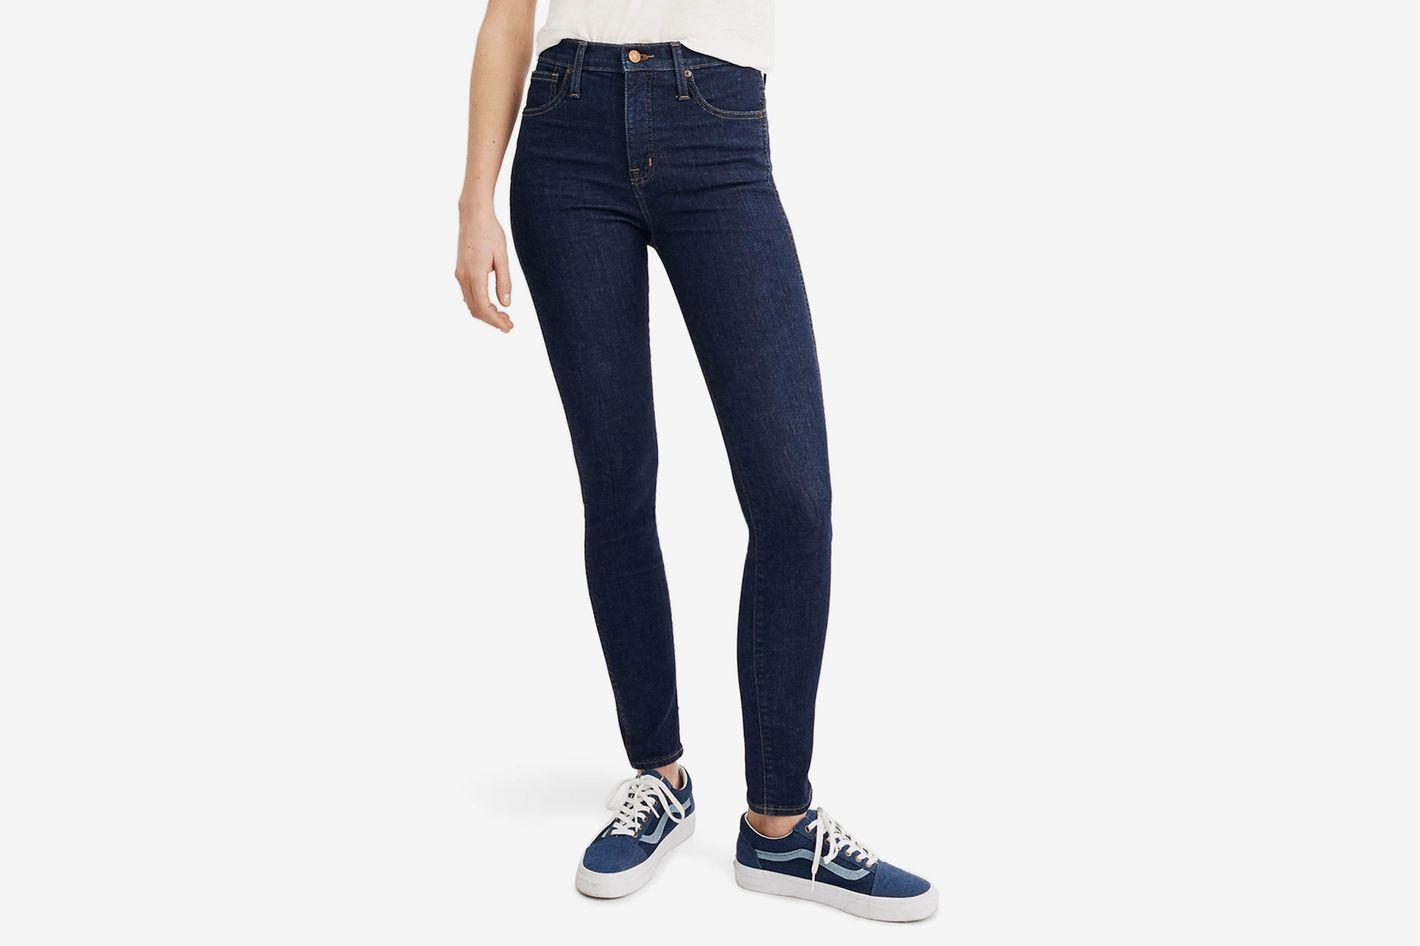 Madewell 10-Inch High Waist Skinny Jeans